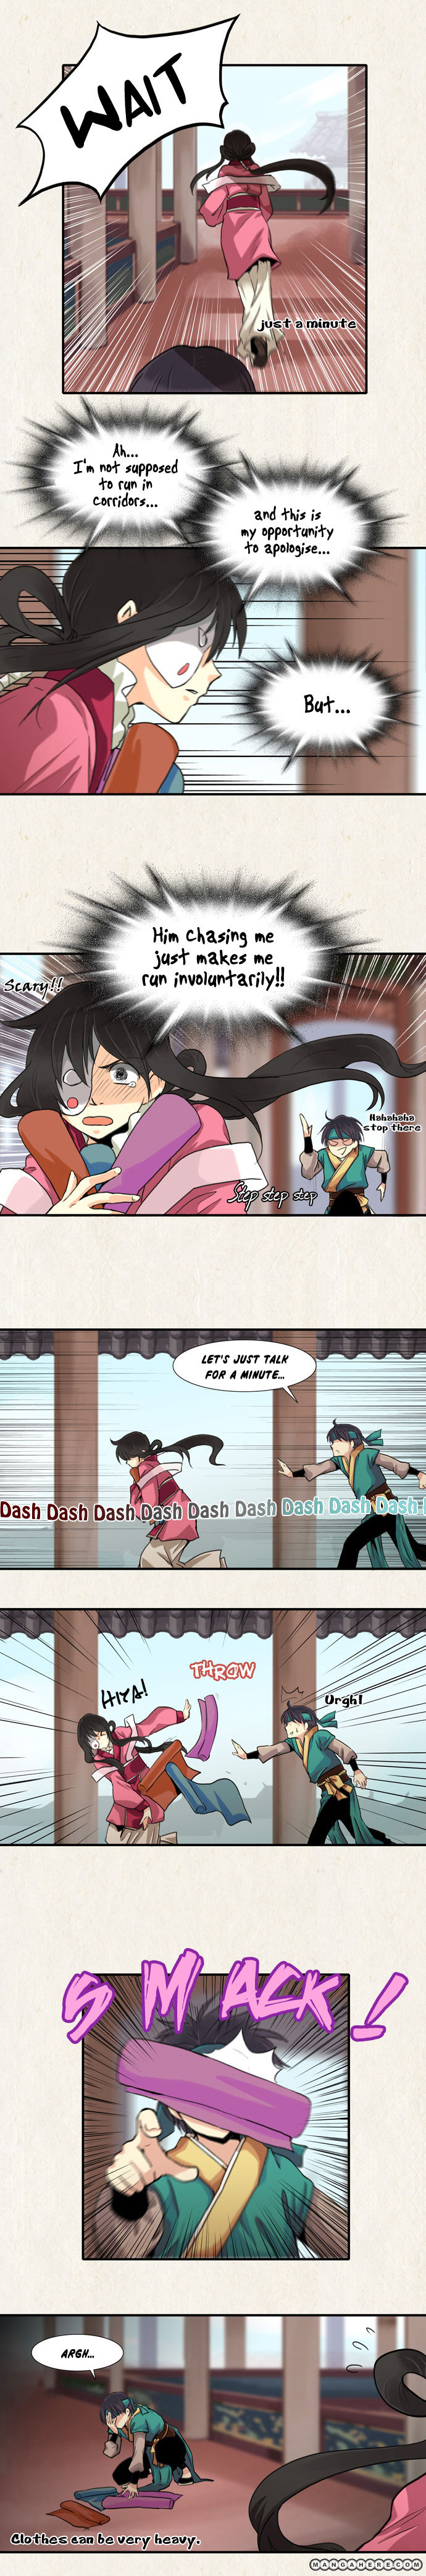 Gyon Woo Jik Nyu 13 Page 2